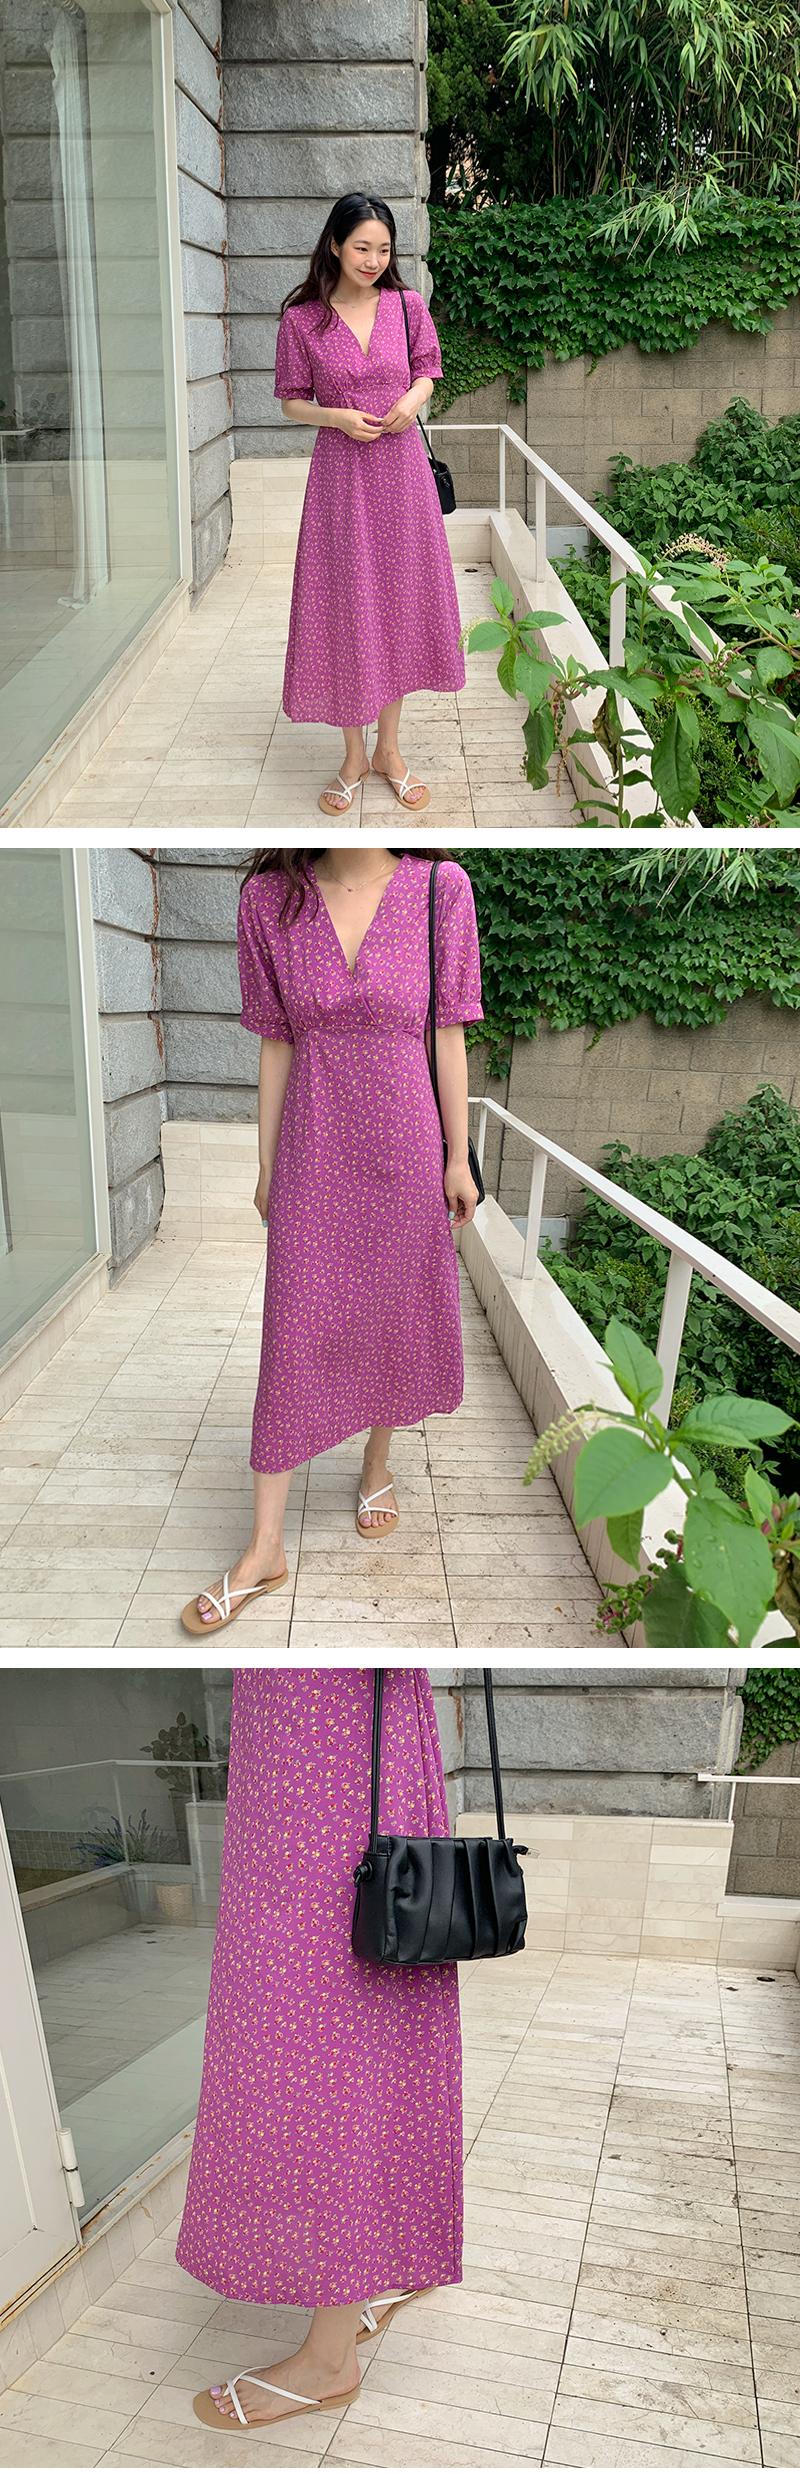 Tiniflower Puffron Dress